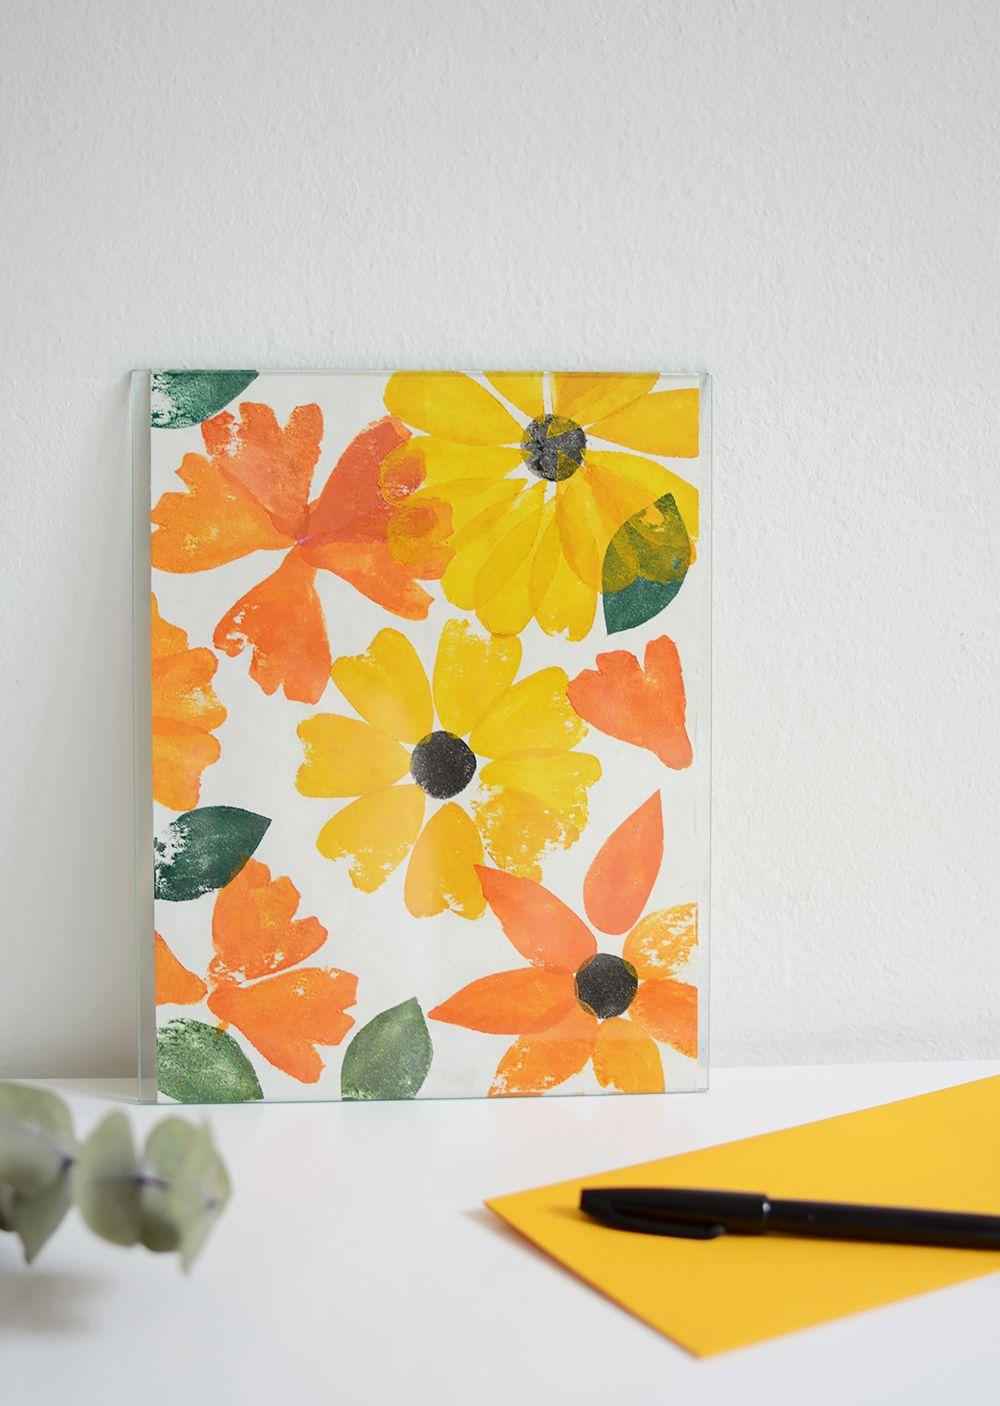 Diy Poster Mit Blumen Stempel Aus Moosgummi Stempel